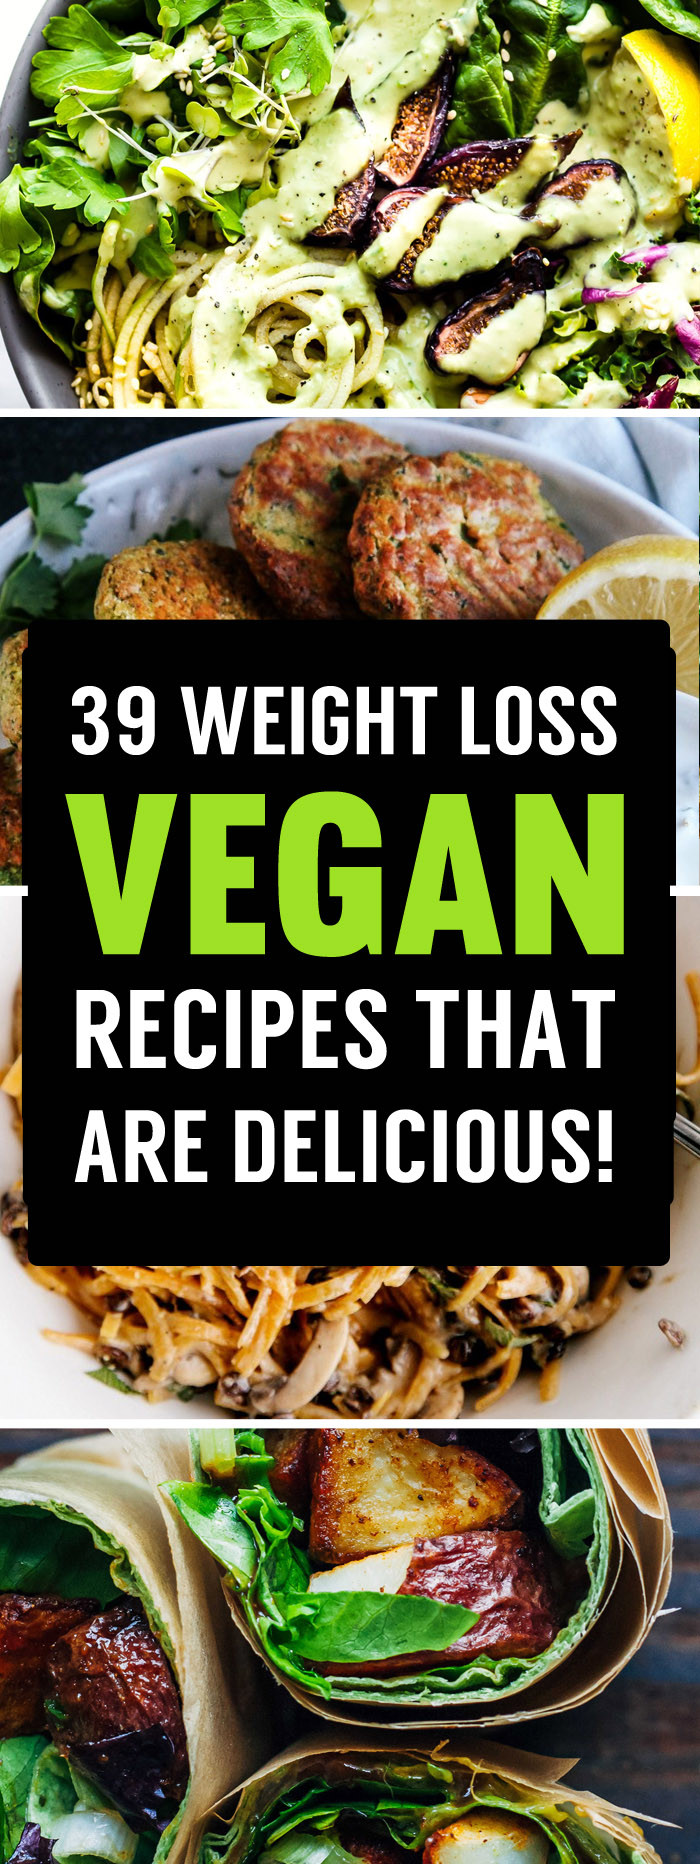 Delicious Healthy Vegan Recipes  39 Delicious Vegan Recipes That Are Perfect For Losing